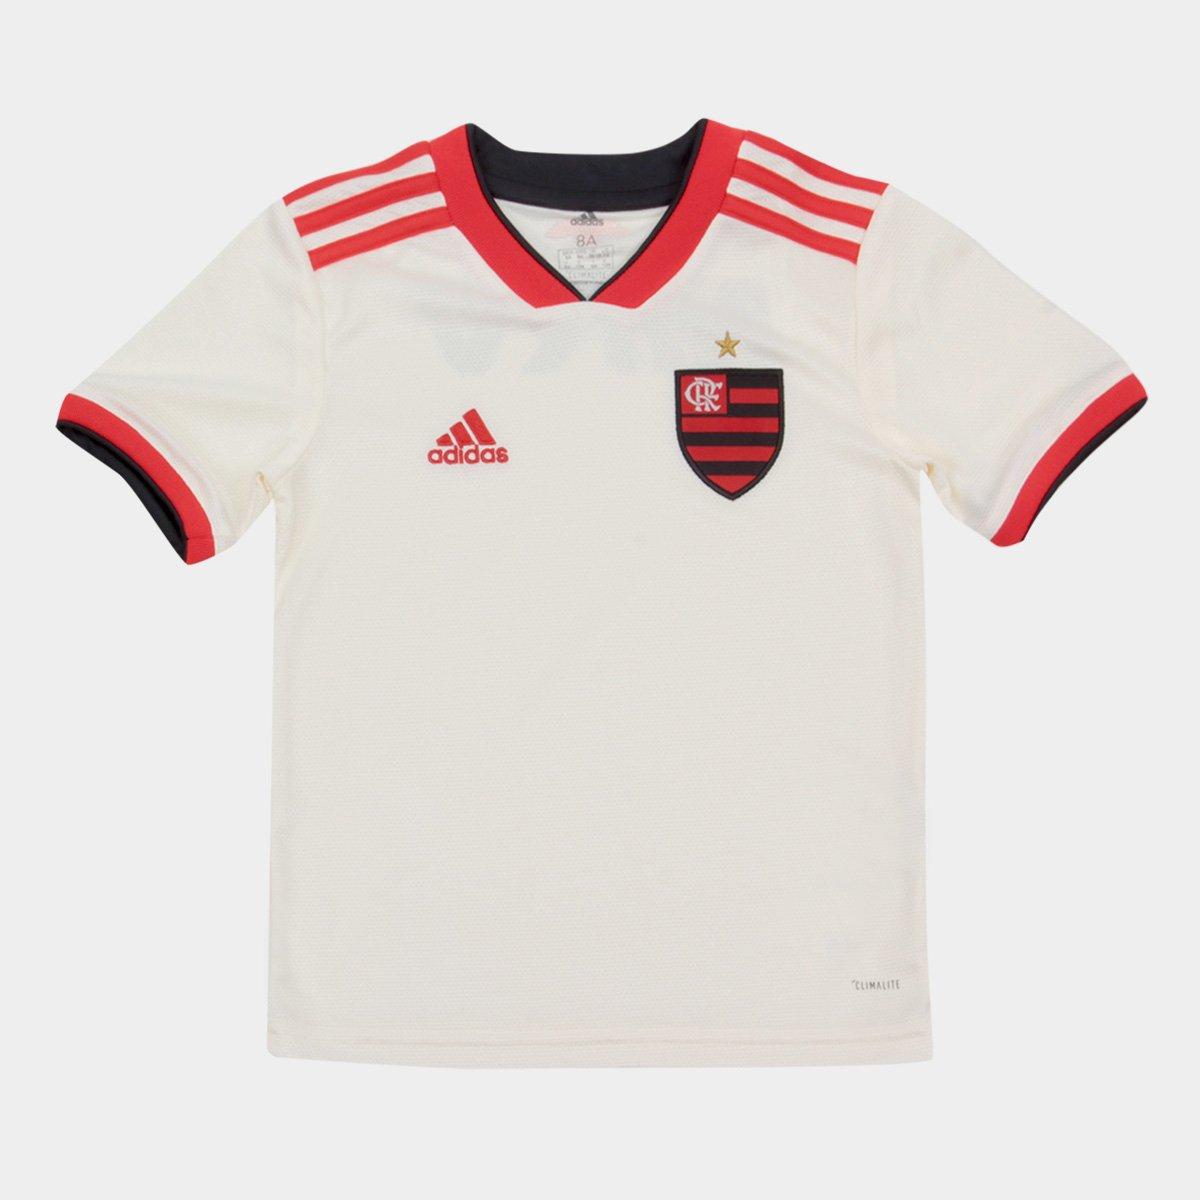 Camisa Flamengo Infantil II 2018 s n° Torcedor Adidas 0585c27cd4862